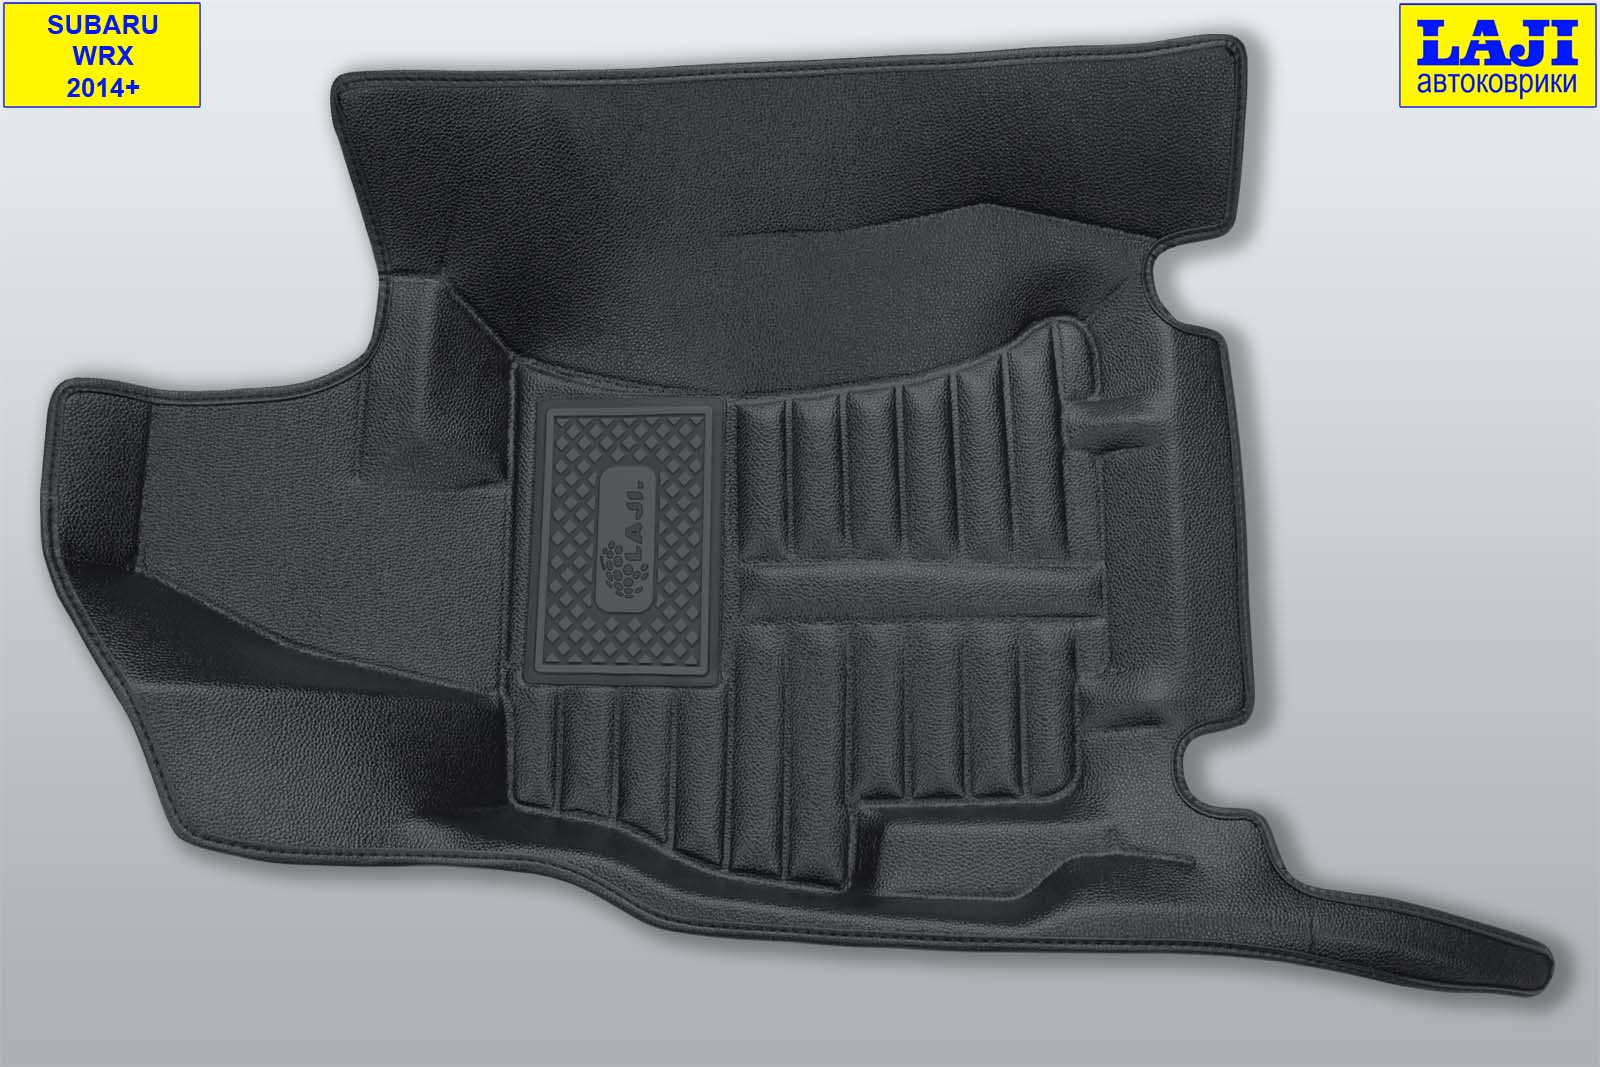 5D коврики в салон Subaru WRX 2014-н.в. 3